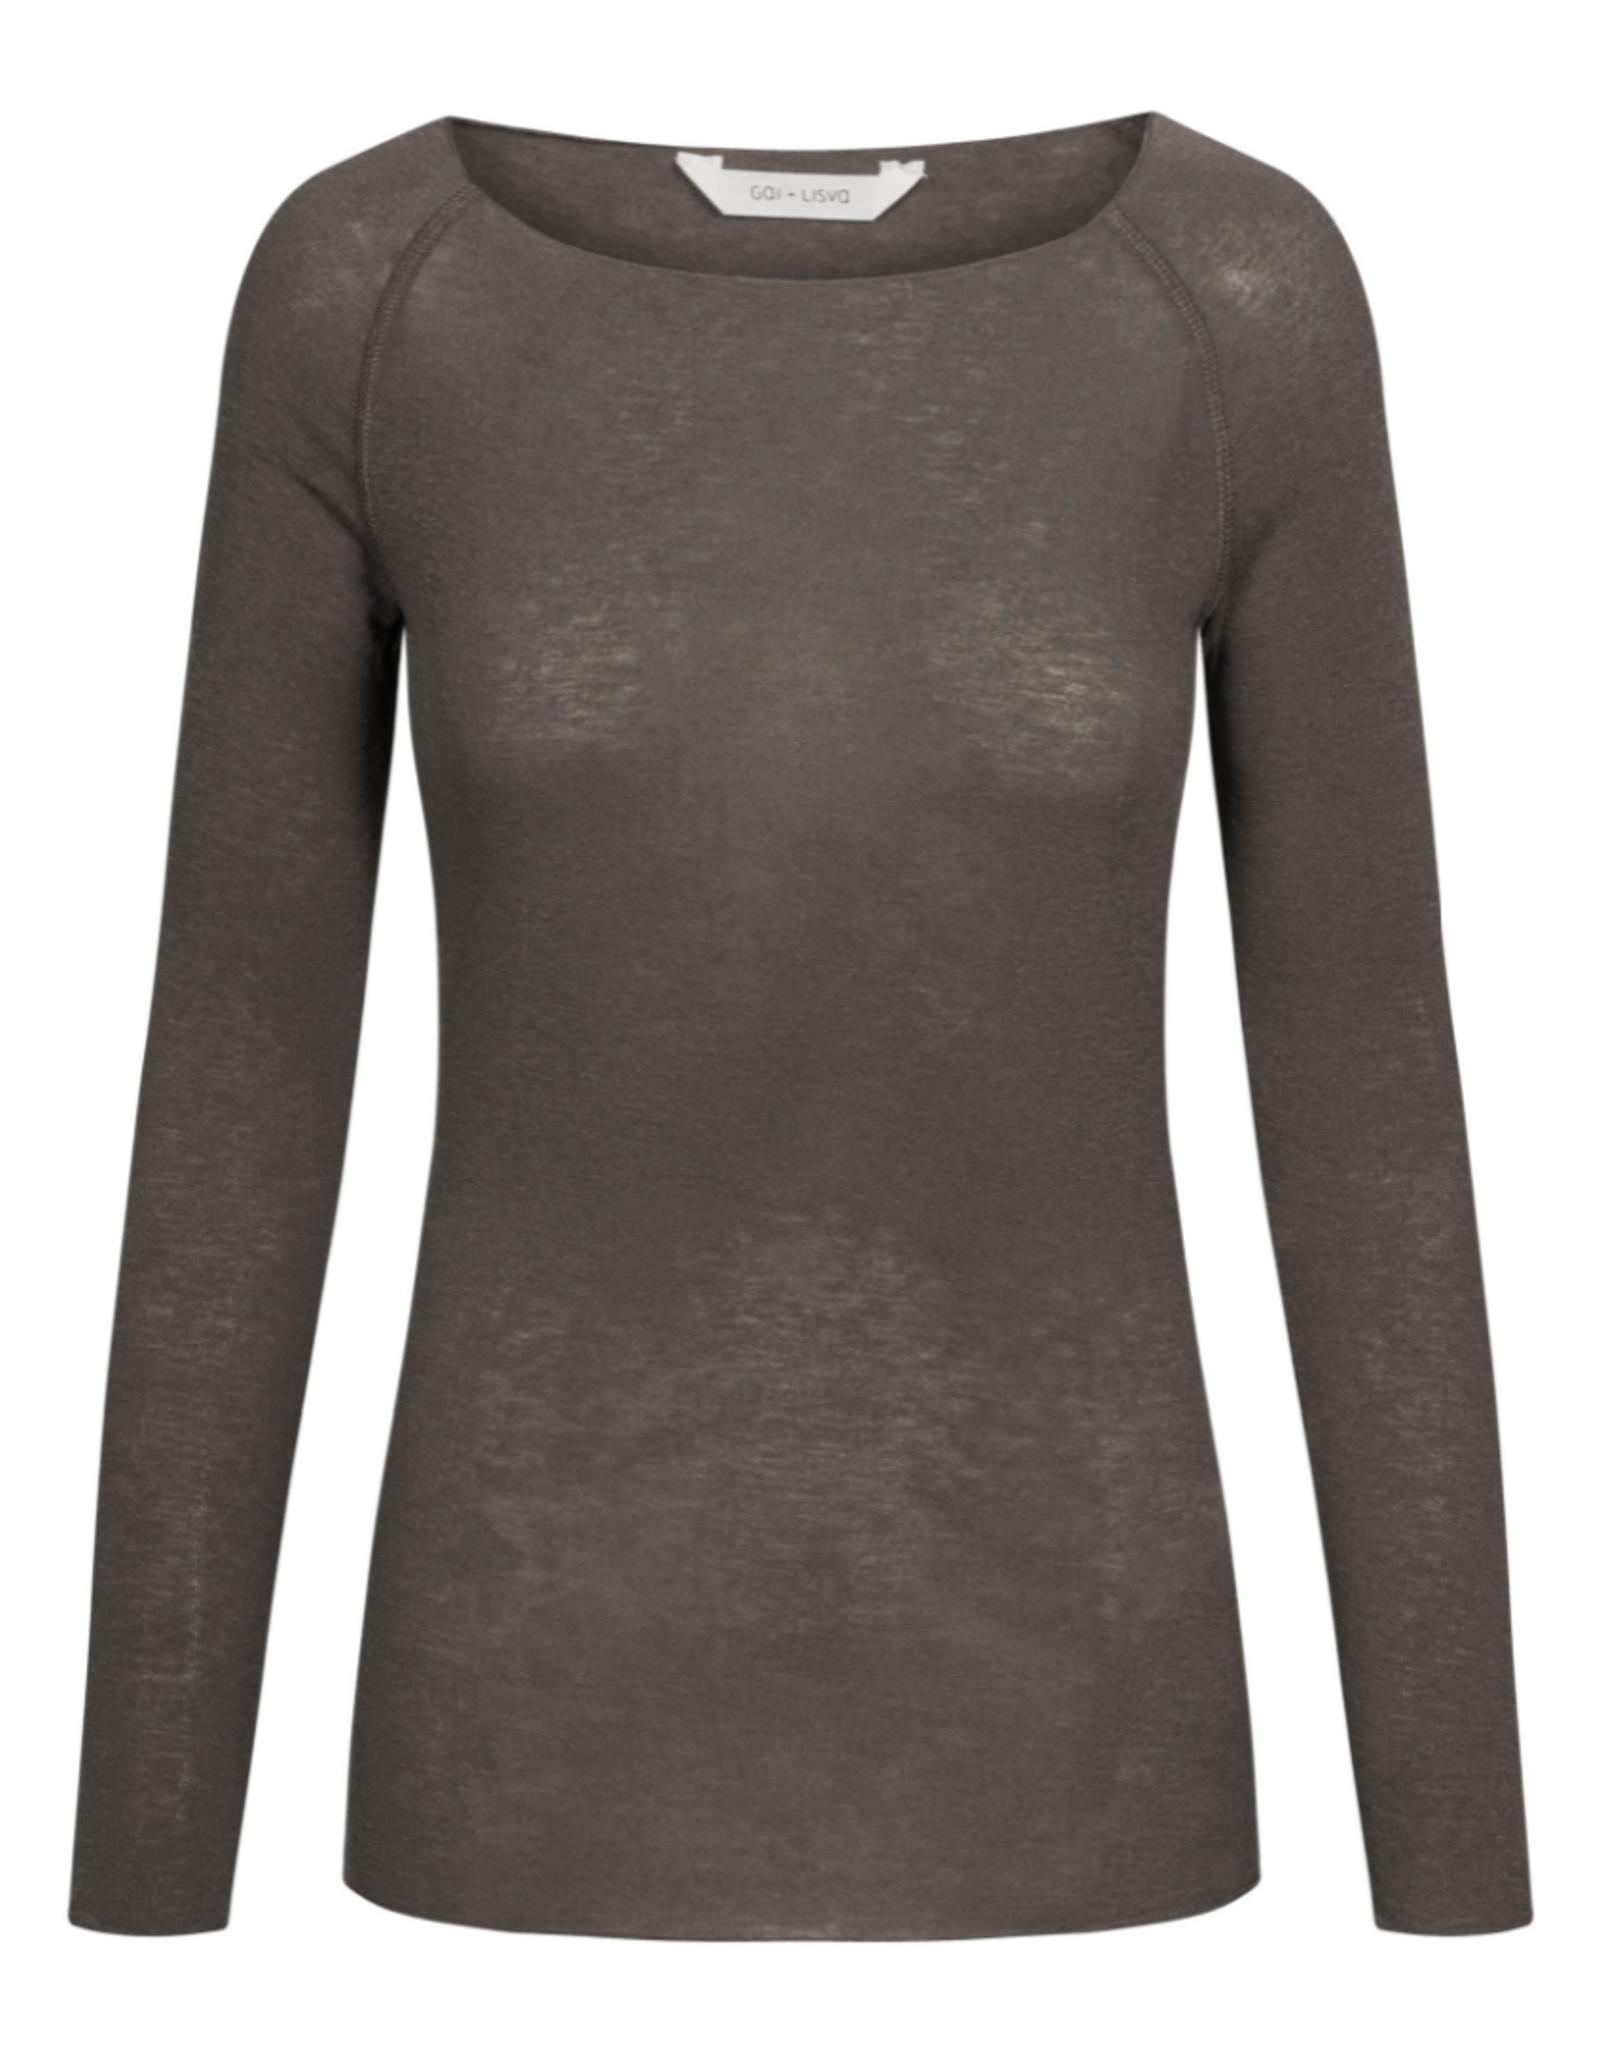 Gai&Lisva Amalie shirt wol/viscose -Soil Brown